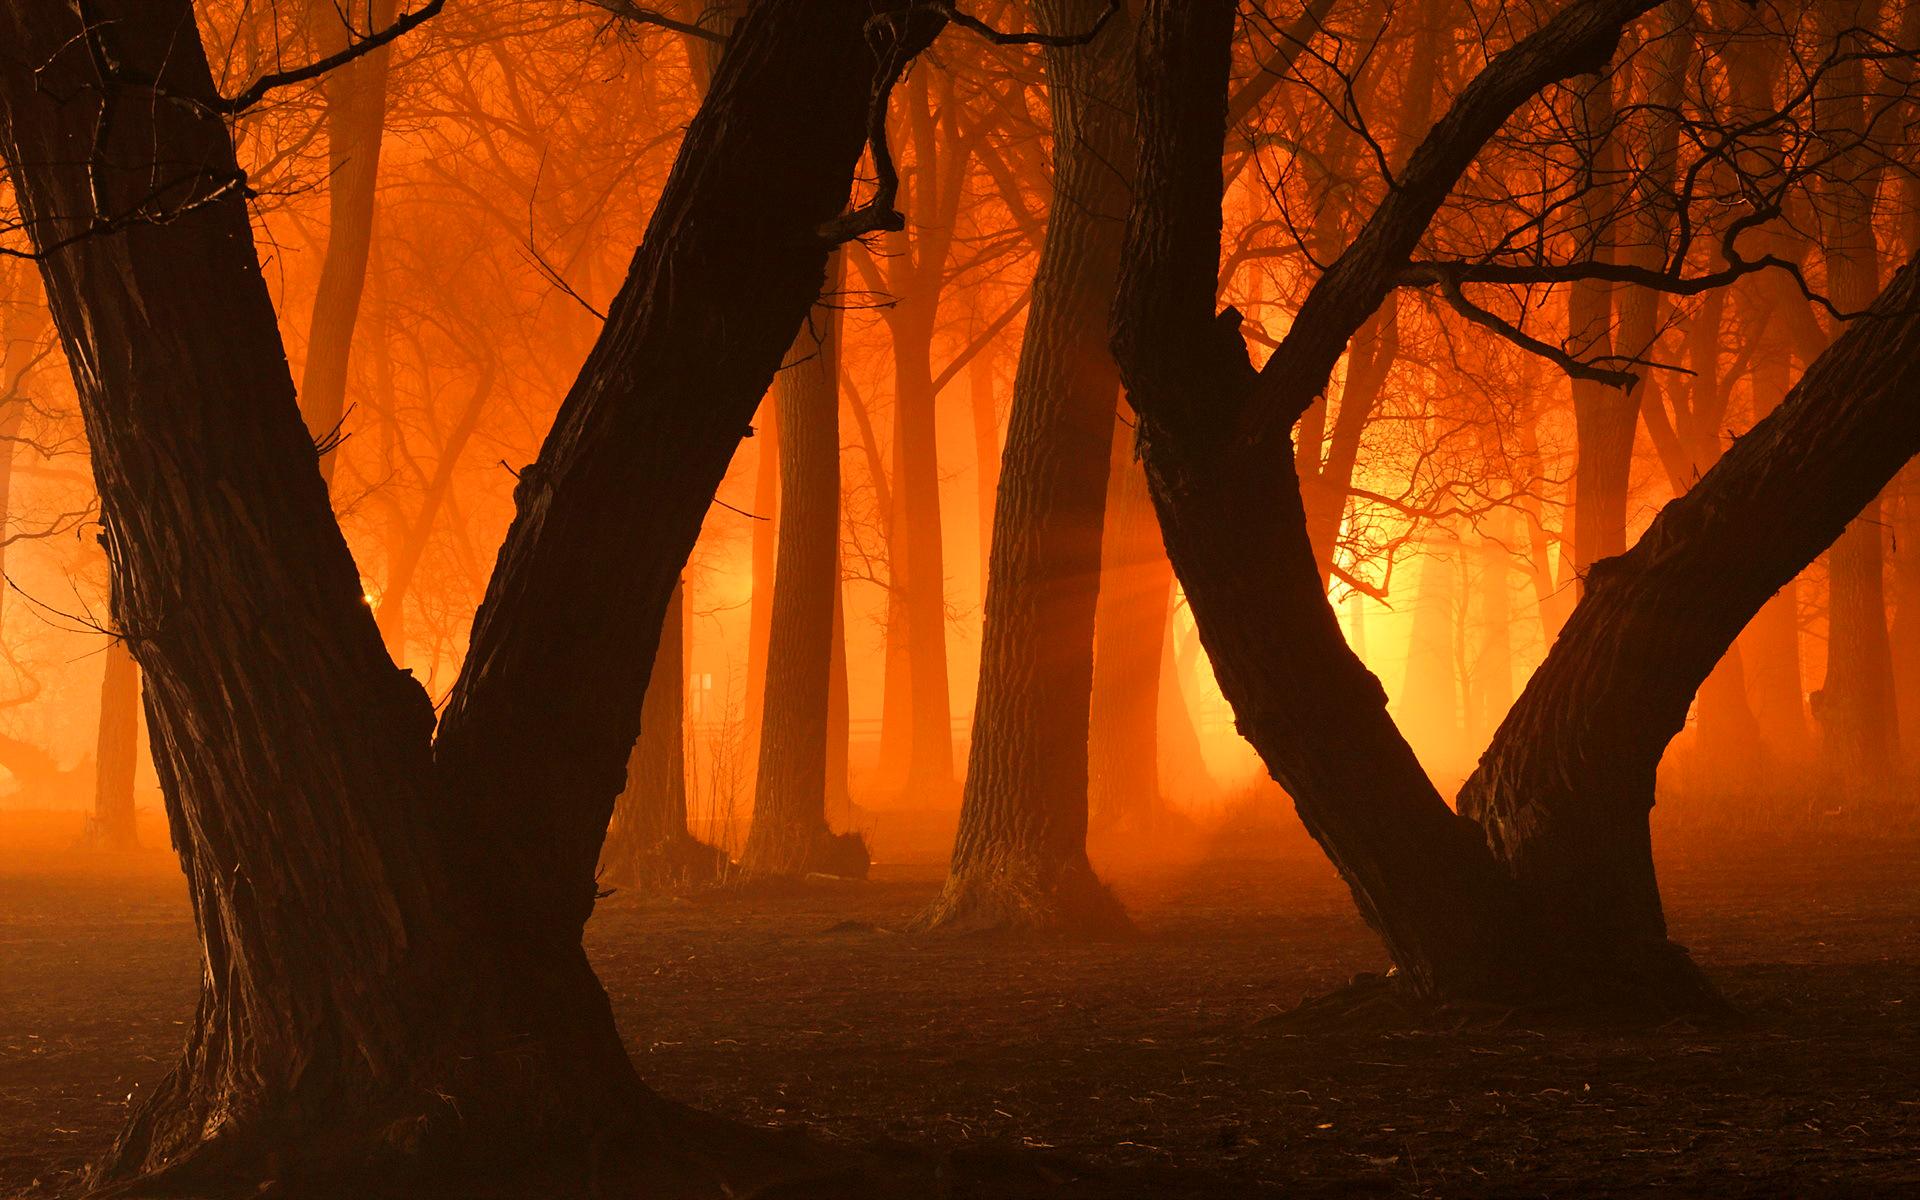 orange forest wallpaper